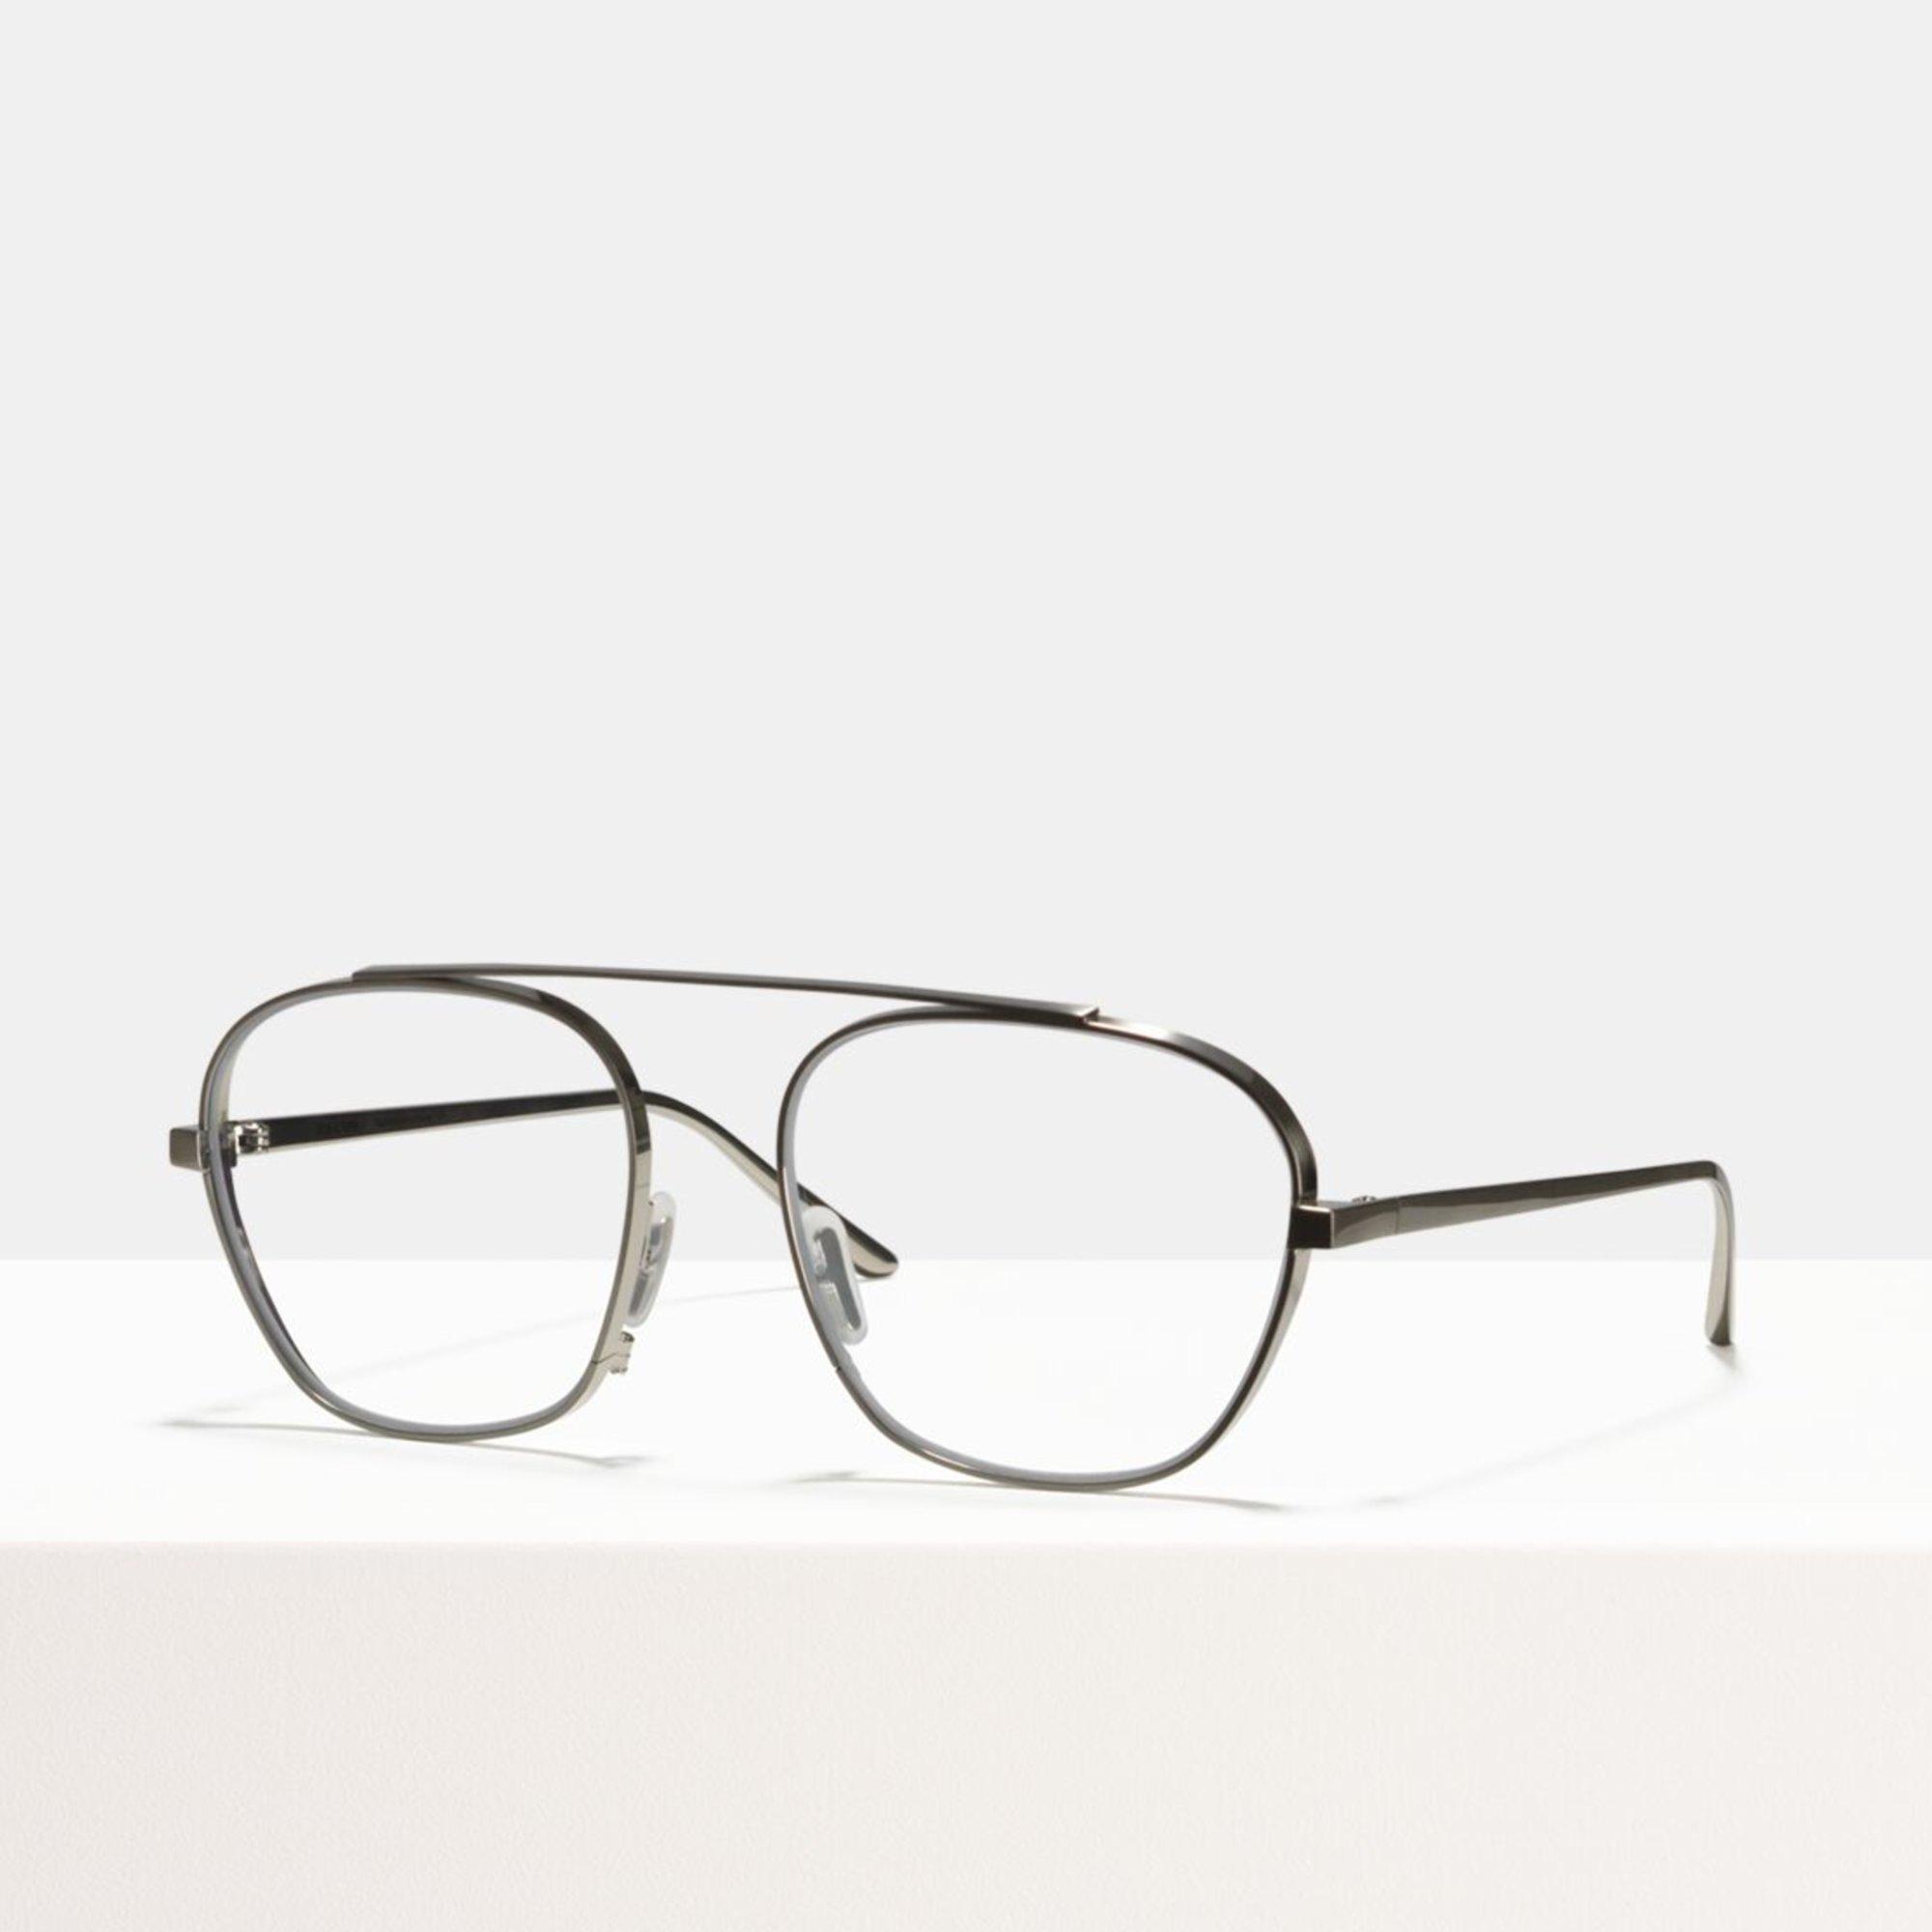 Ace & Tate Glasses | square titanium in Silver